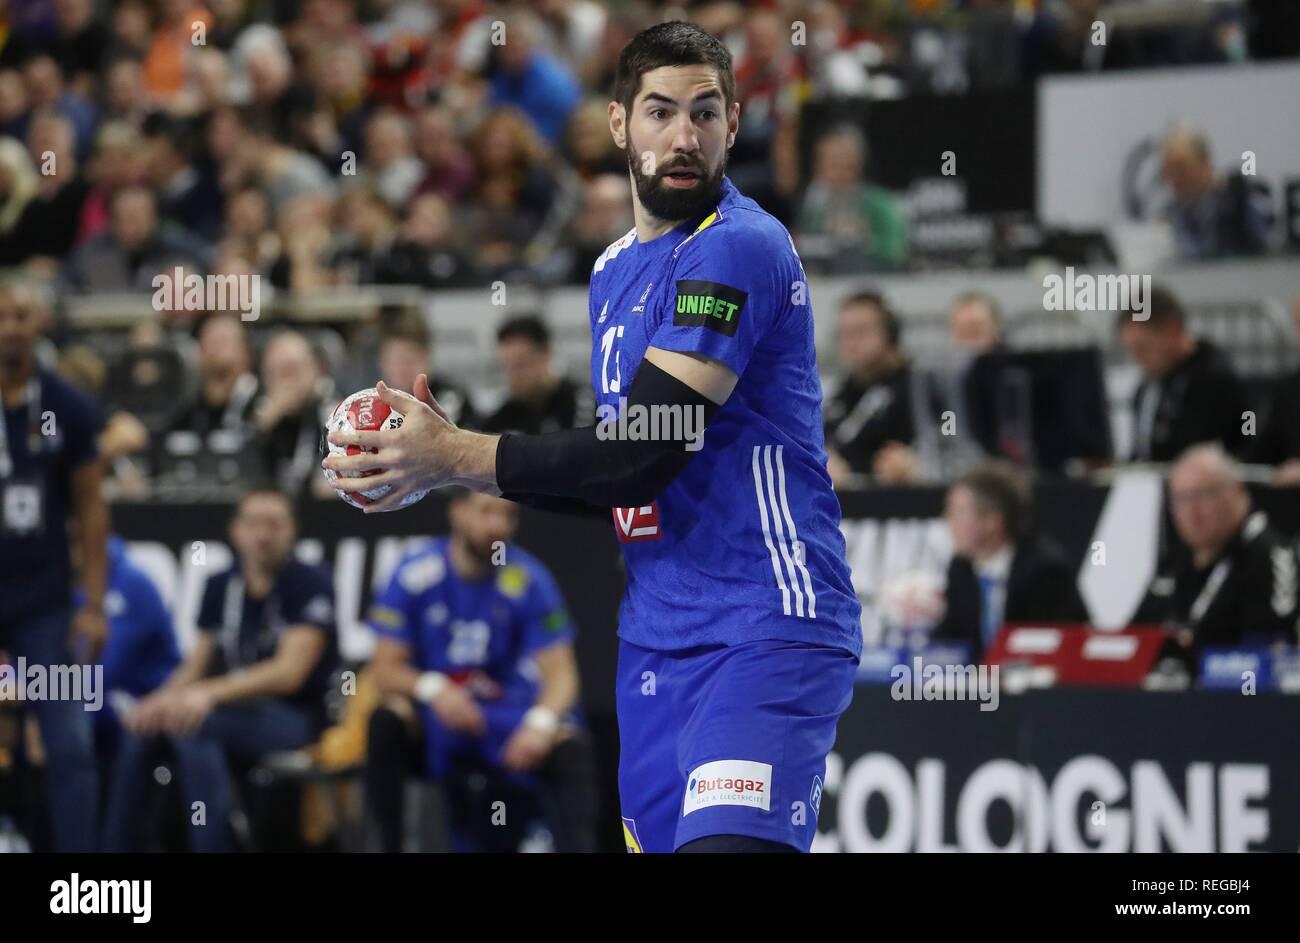 firo: 19.01.2019, Handball: World Cup World Cup Main Round France - Spain Single Action, Nikola Karabatic, FRA   usage worldwide - Stock Image